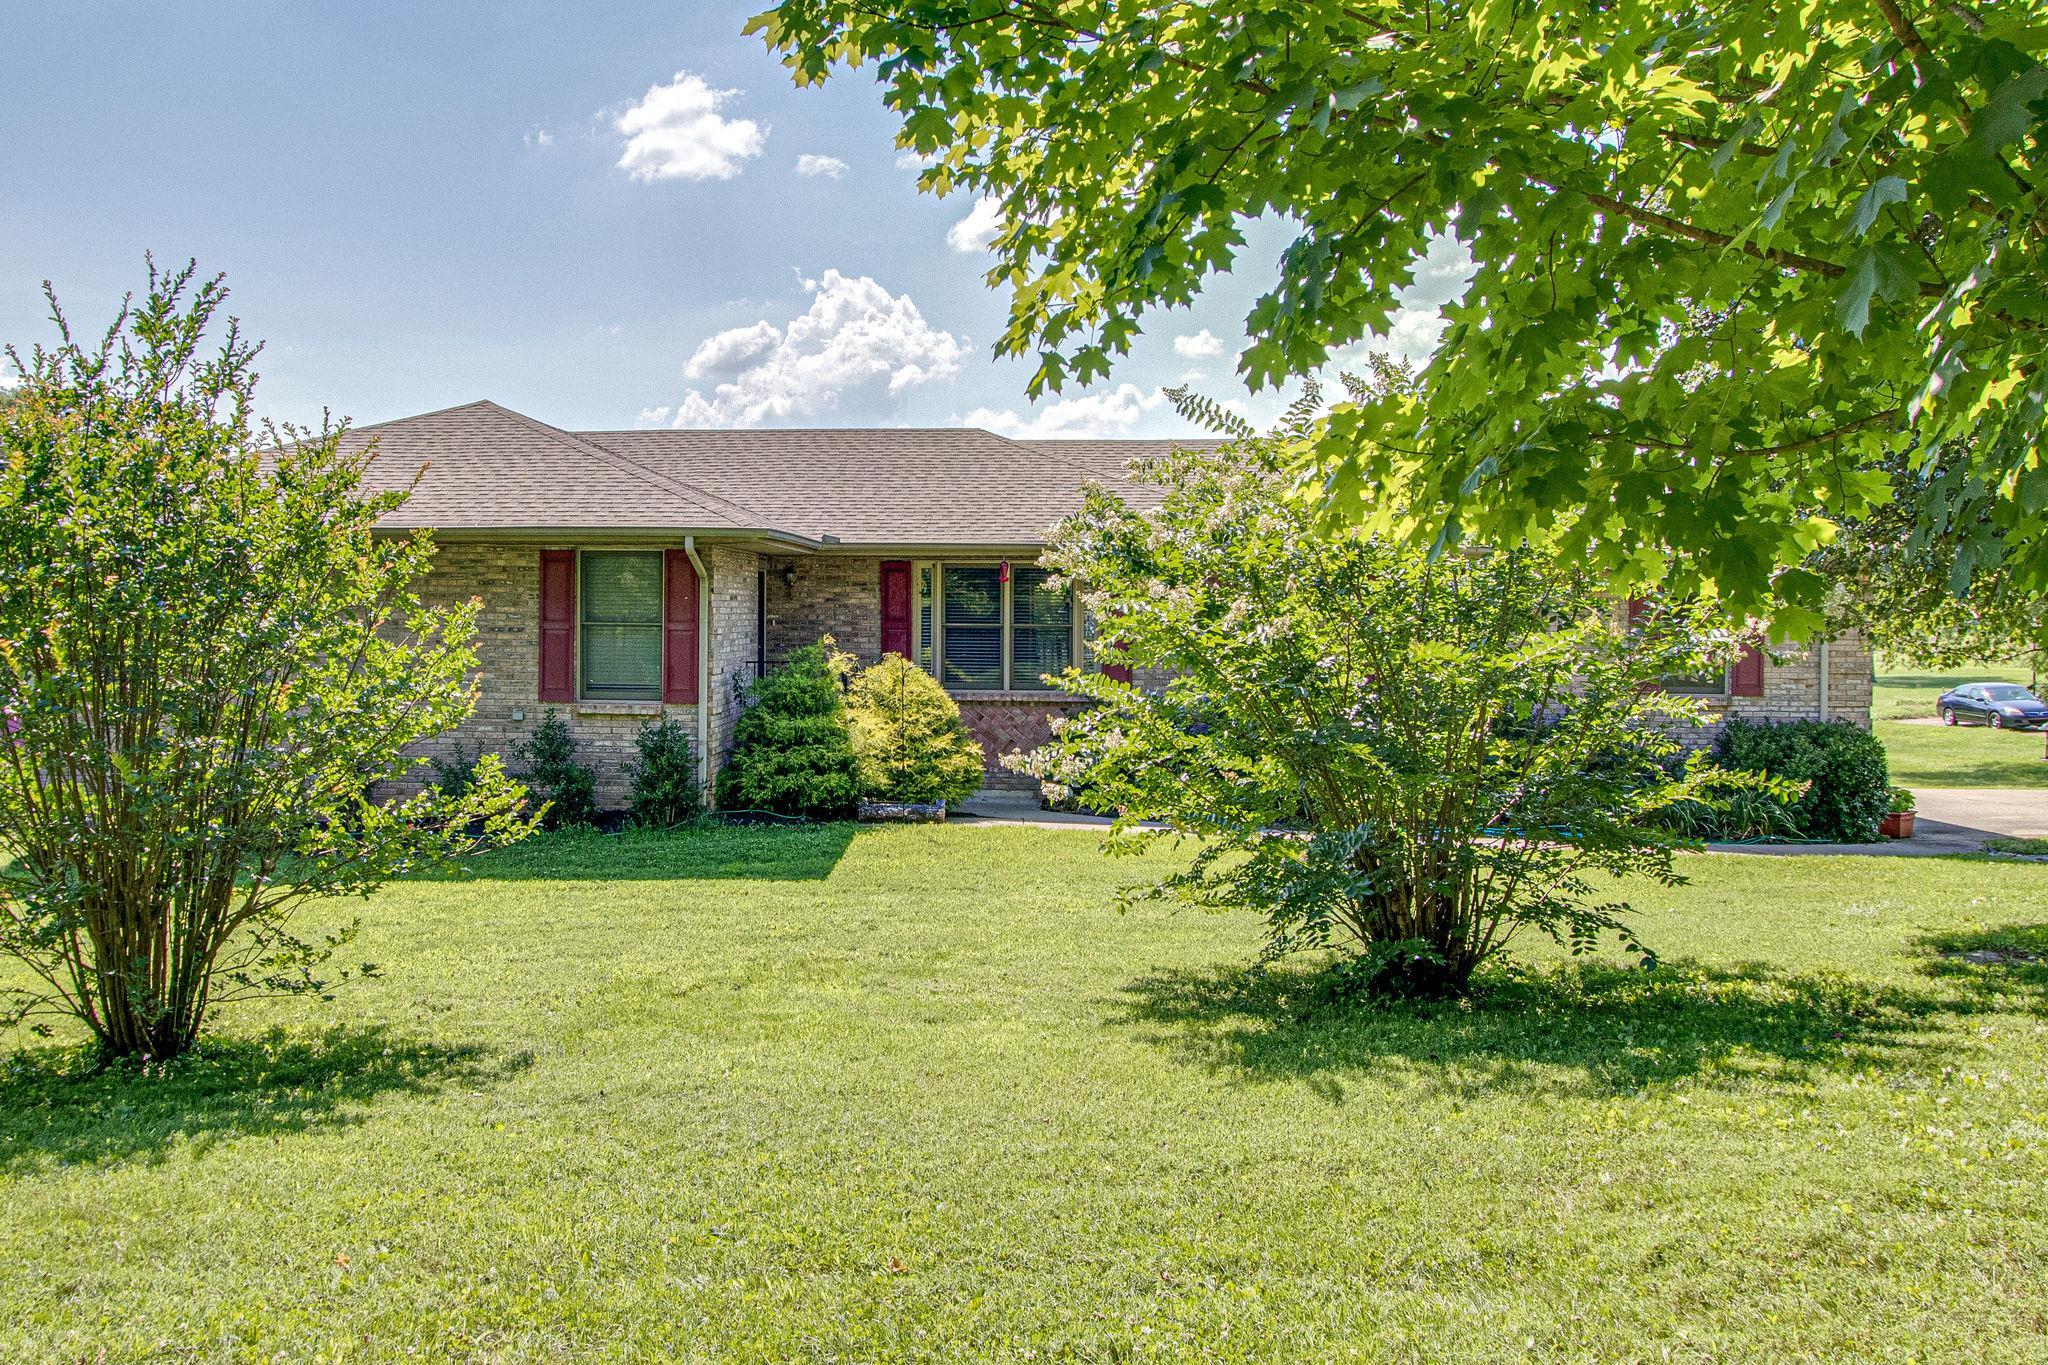 1007 Brave Hill Rd, Castalian Springs, TN 37031 - Castalian Springs, TN real estate listing